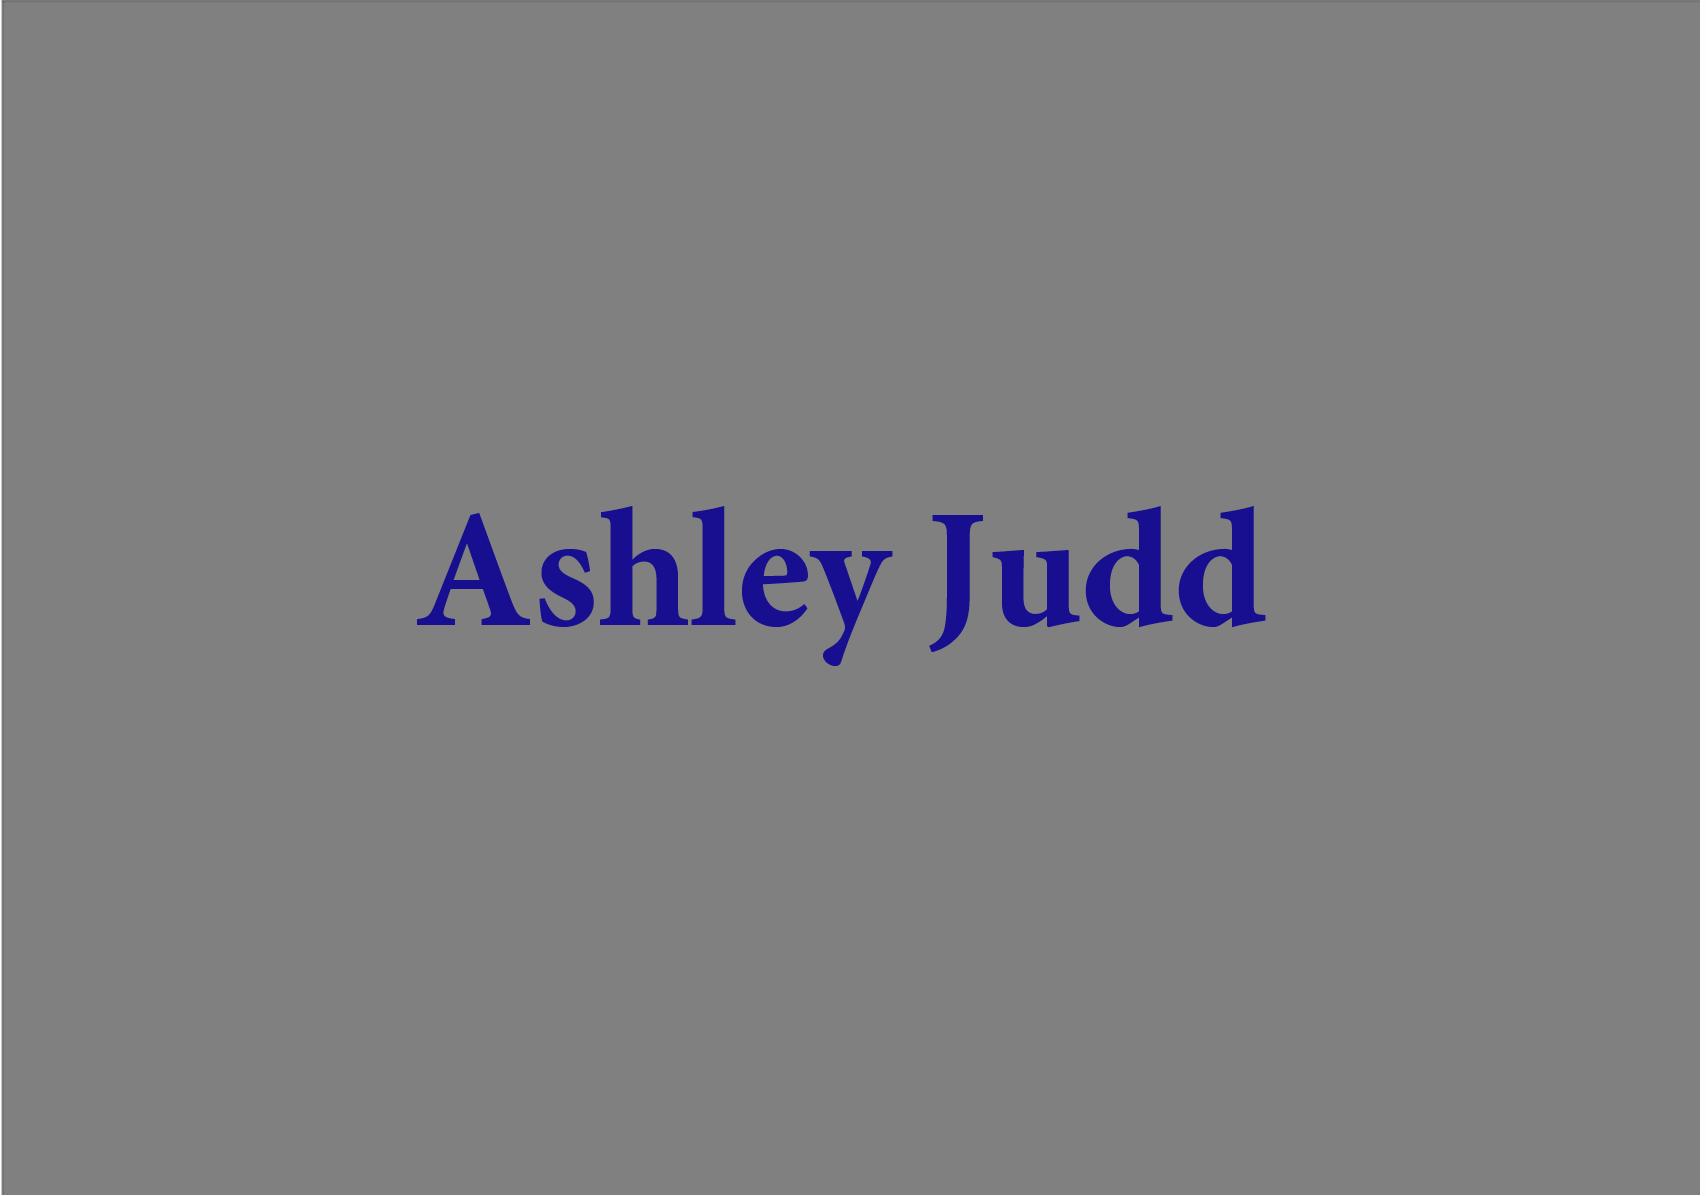 ashley judd.png